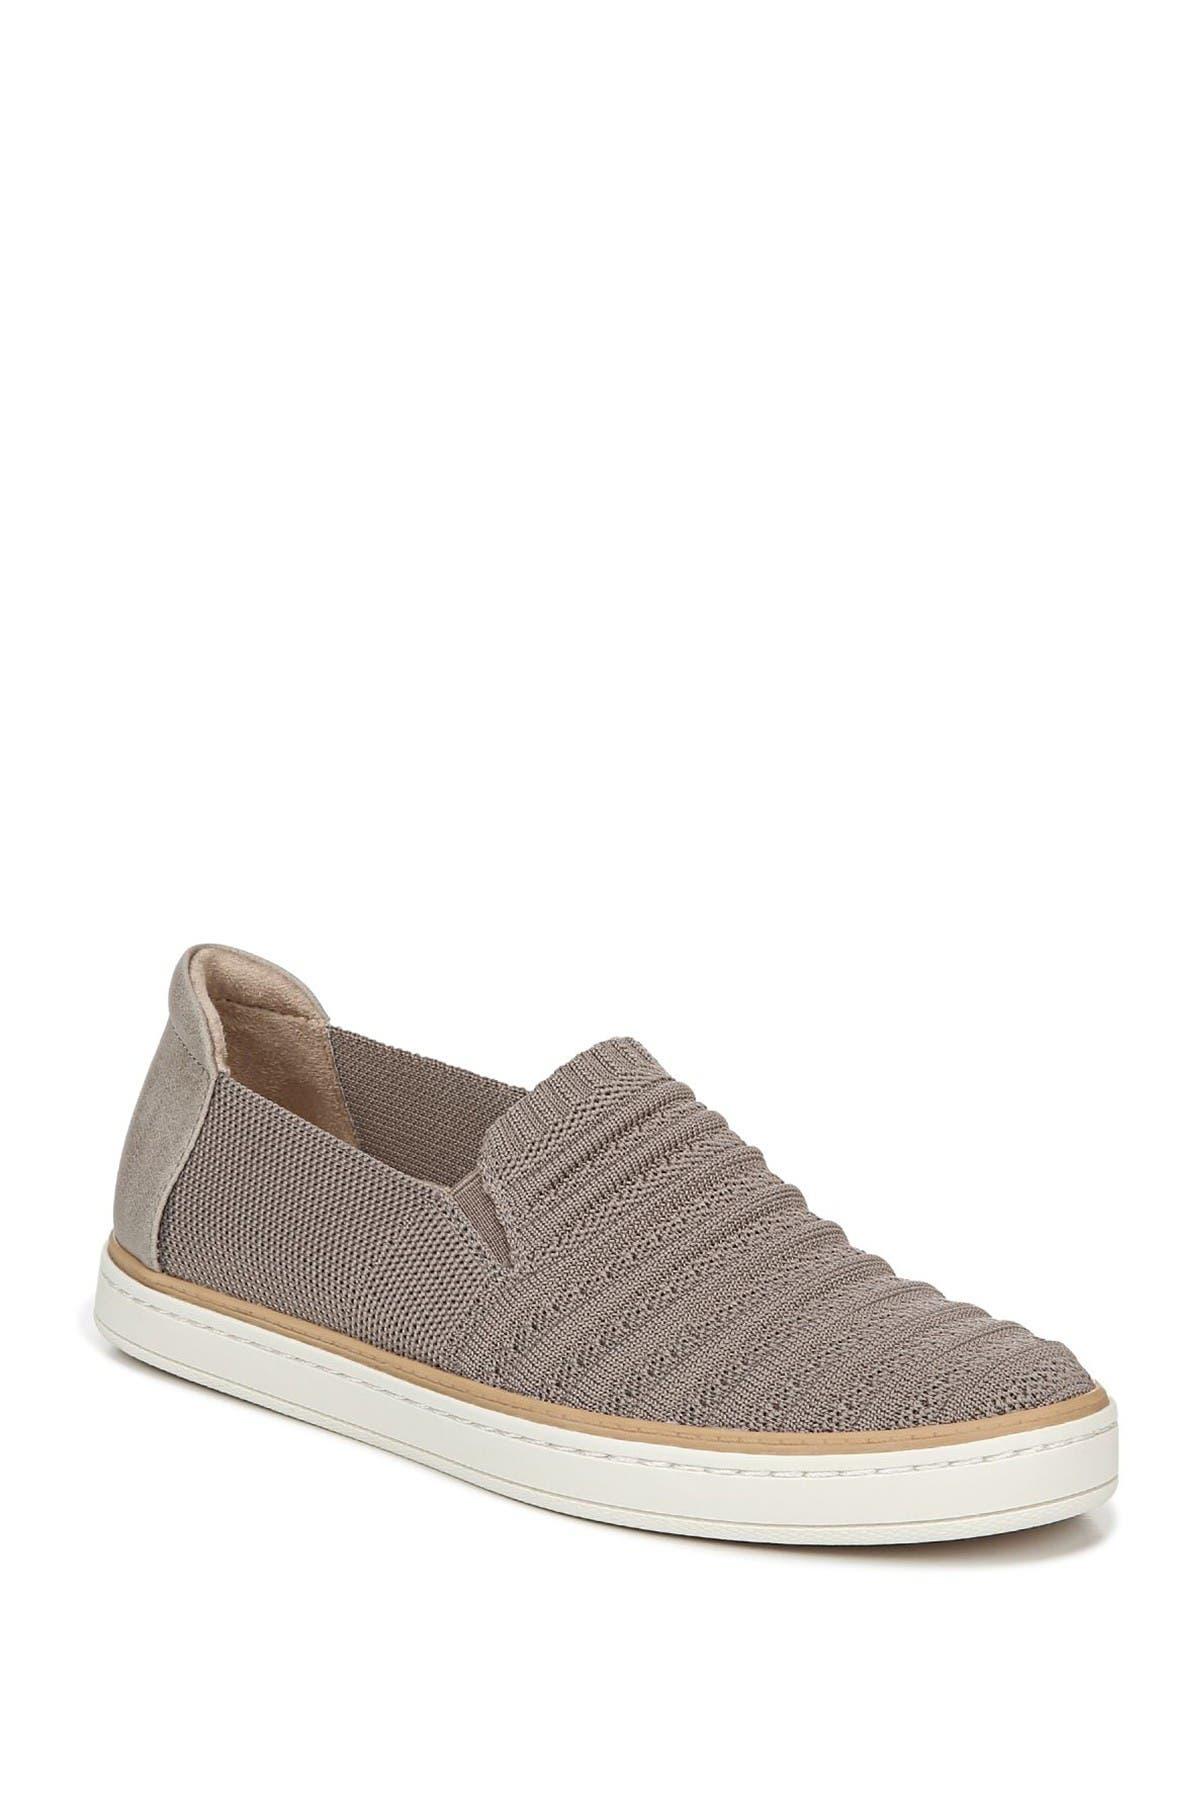 Image of SOUL Naturalizer Kemper Slip-On Sneaker